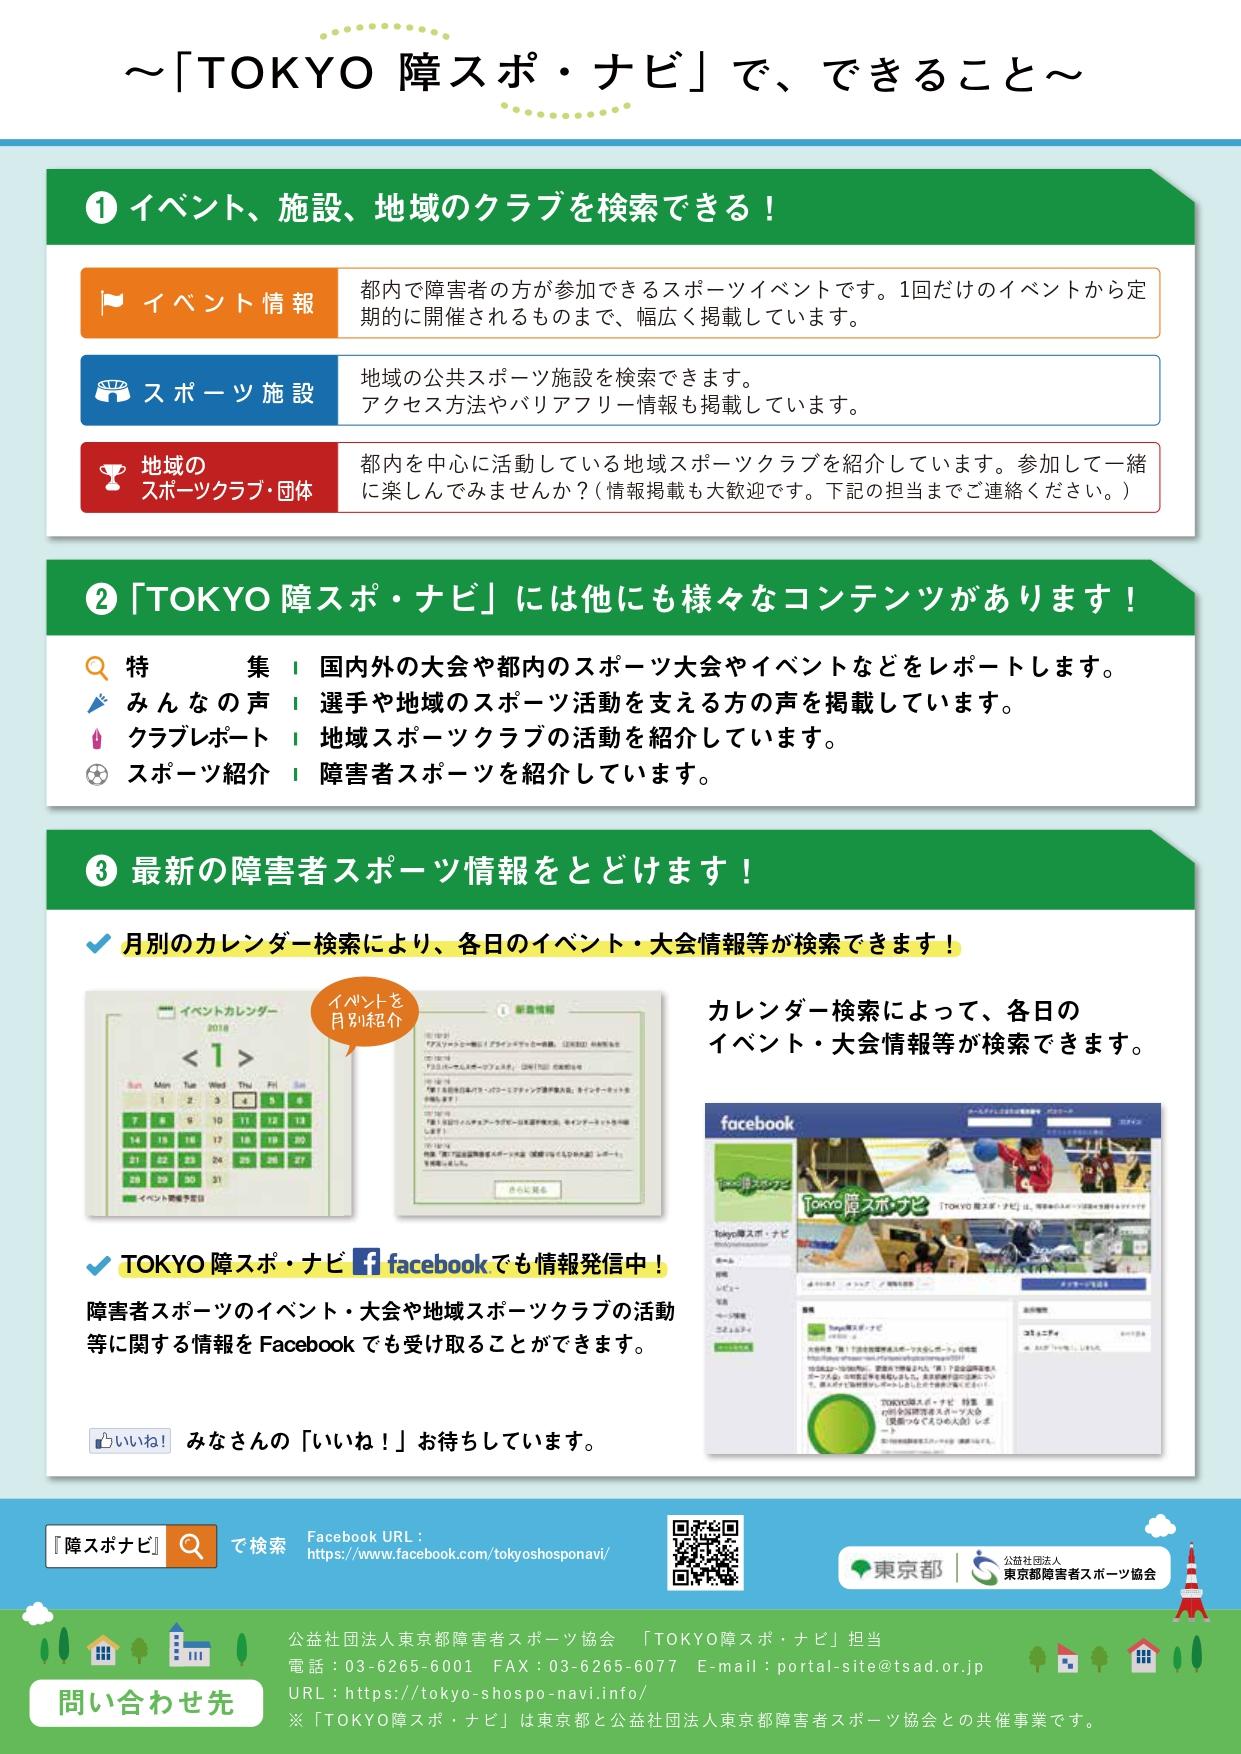 e03582bb32881b4d14c9772dc04fbfe5 - 「TOKYO障スポ・ナビ」公式Twitter開設のお知らせ